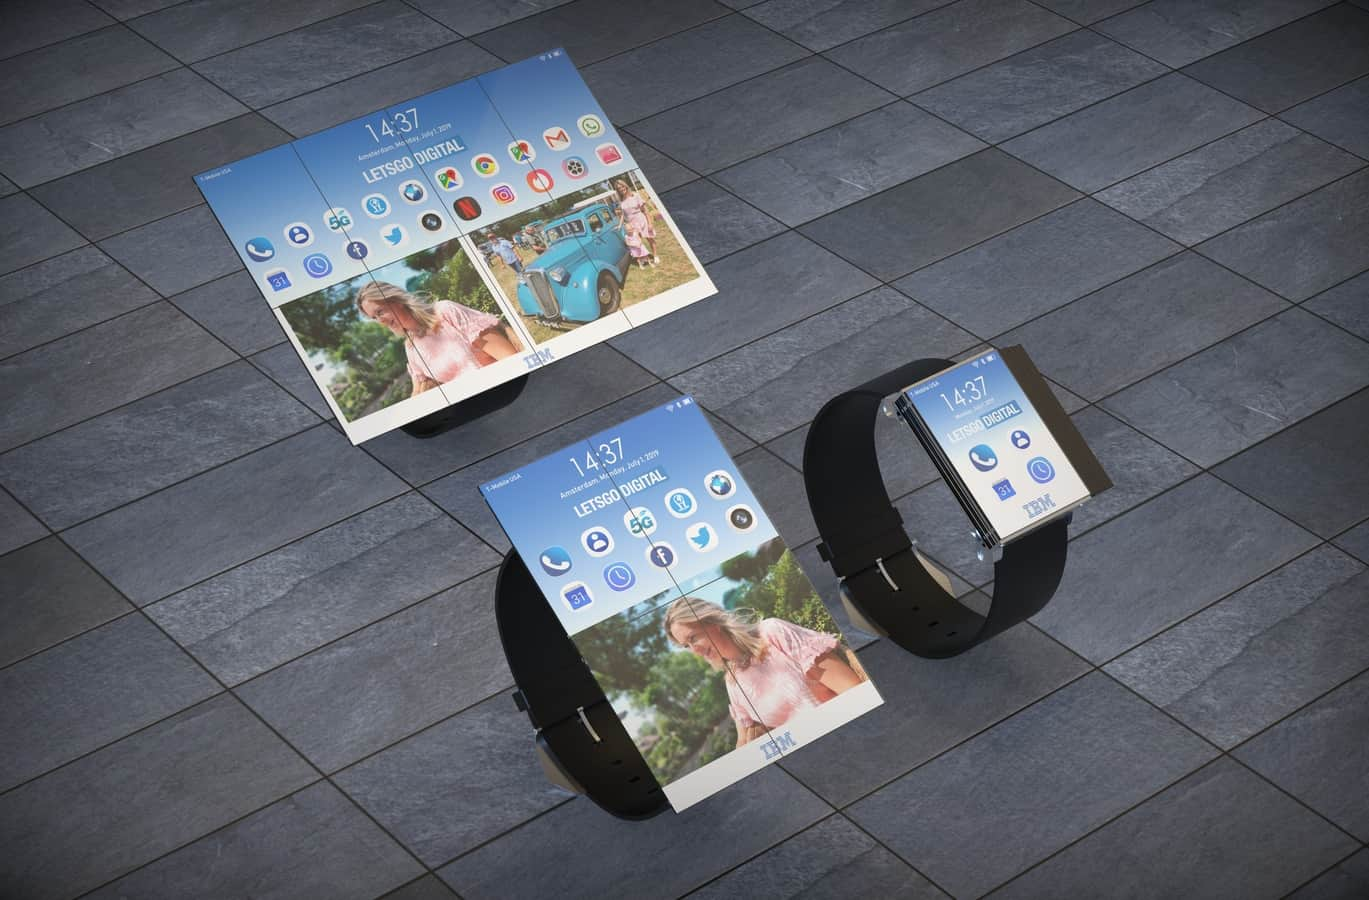 IBM smartwatch patent 1